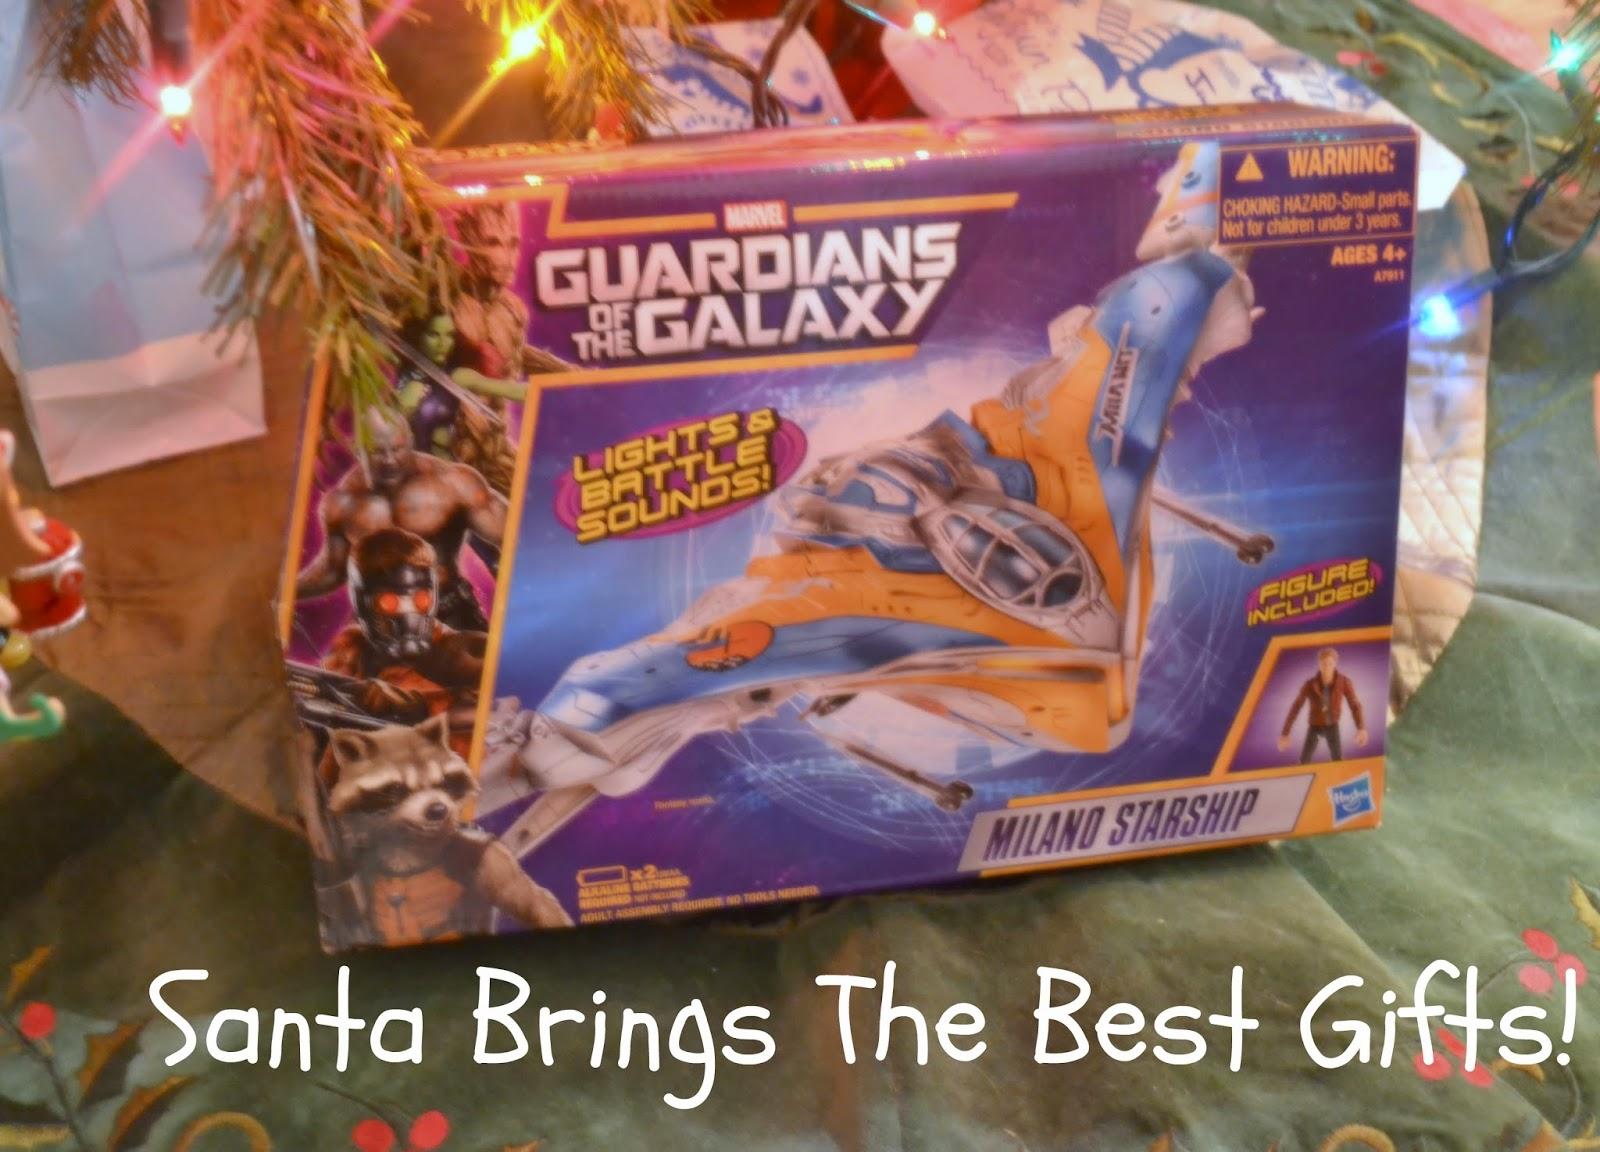 Guardians of the Galaxy, Guardians of the Galaxy soundtrack, Rocket Raccoon, Drax, Stocking Stuffer Ideas for boys